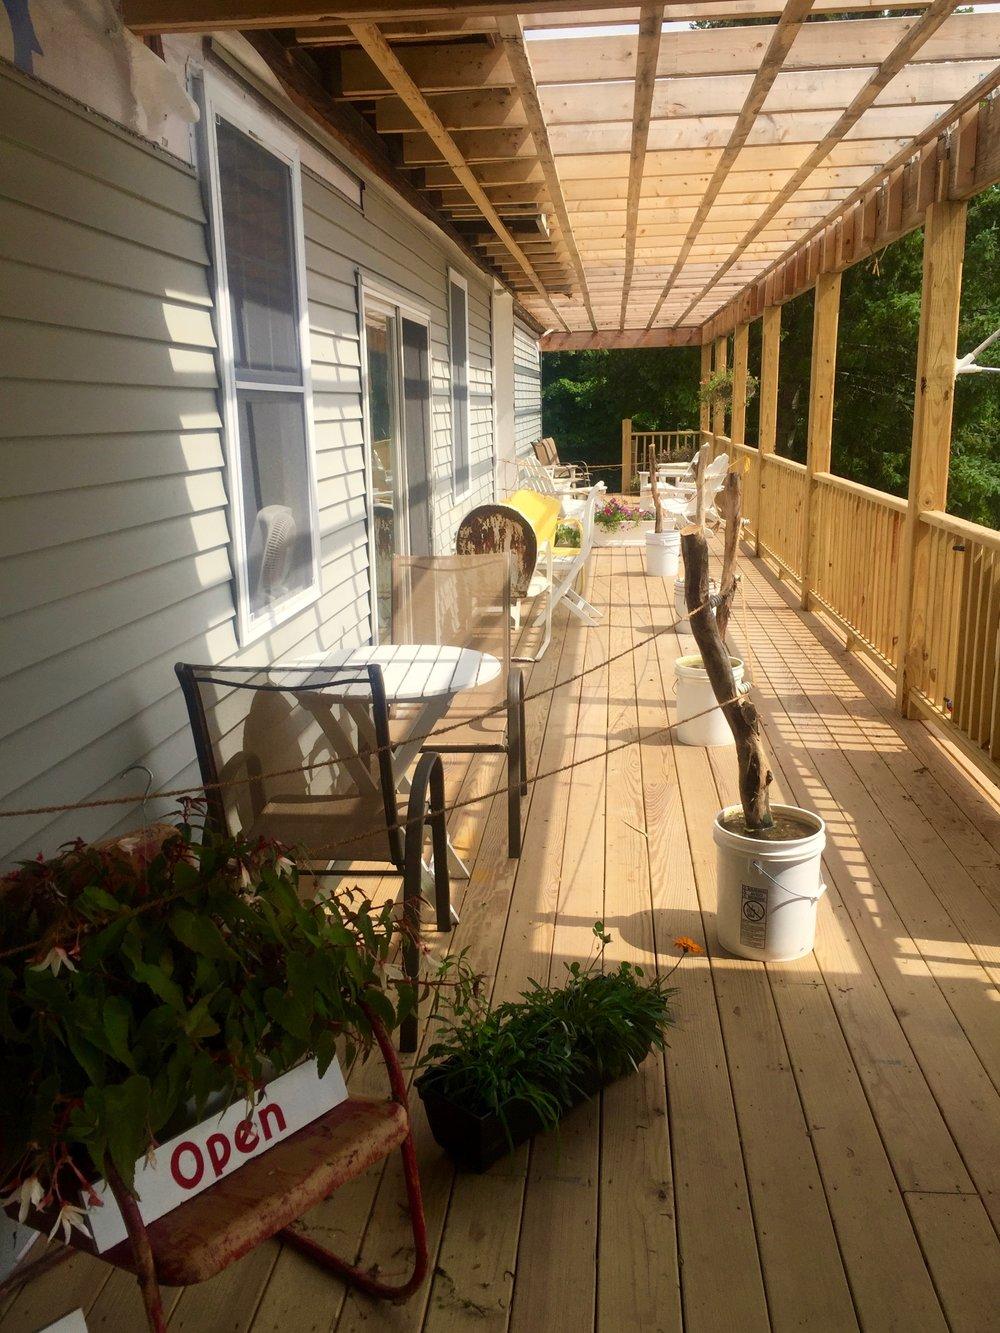 Kuhar Family Farm outdoor seating